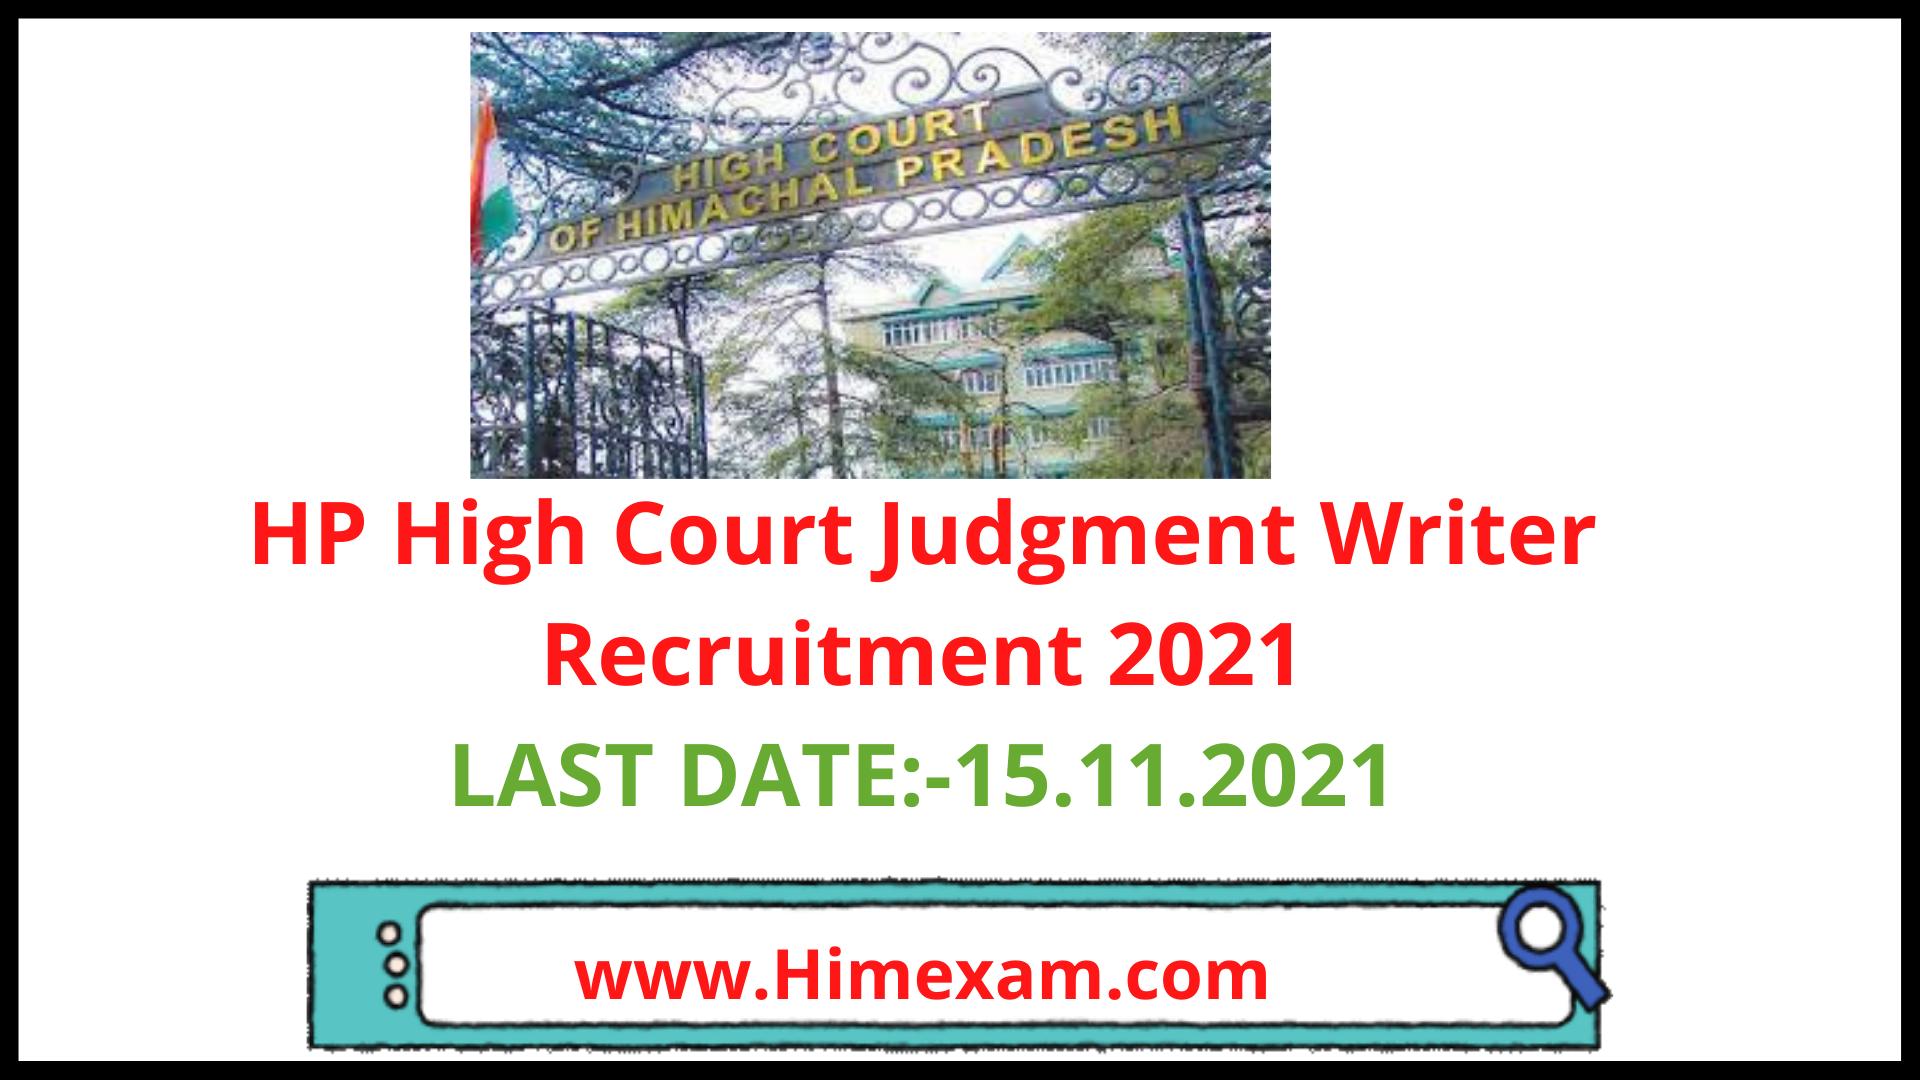 HP High Court Judgment Writer Recruitment 2021